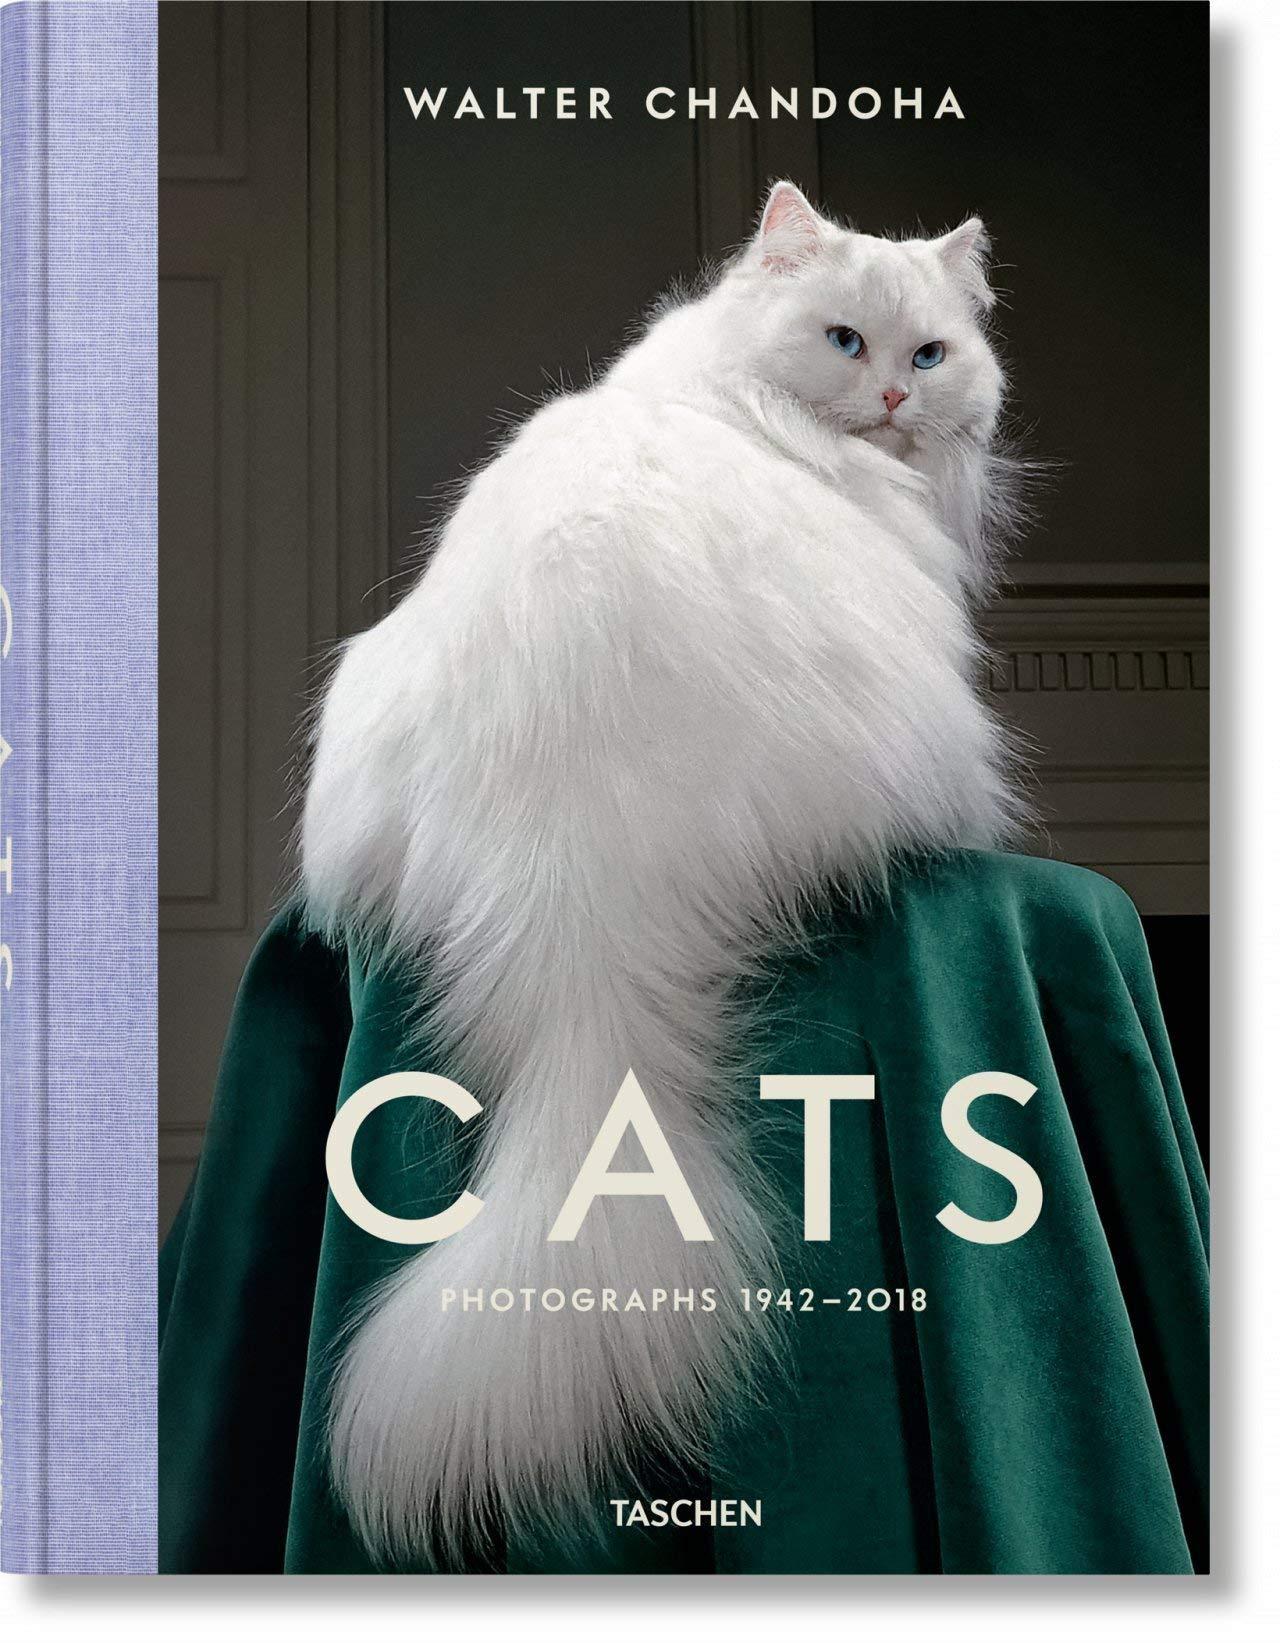 Walter Chandoha. Cats. Photographs 1942-2018 by INGRAM BOOK COMPANY